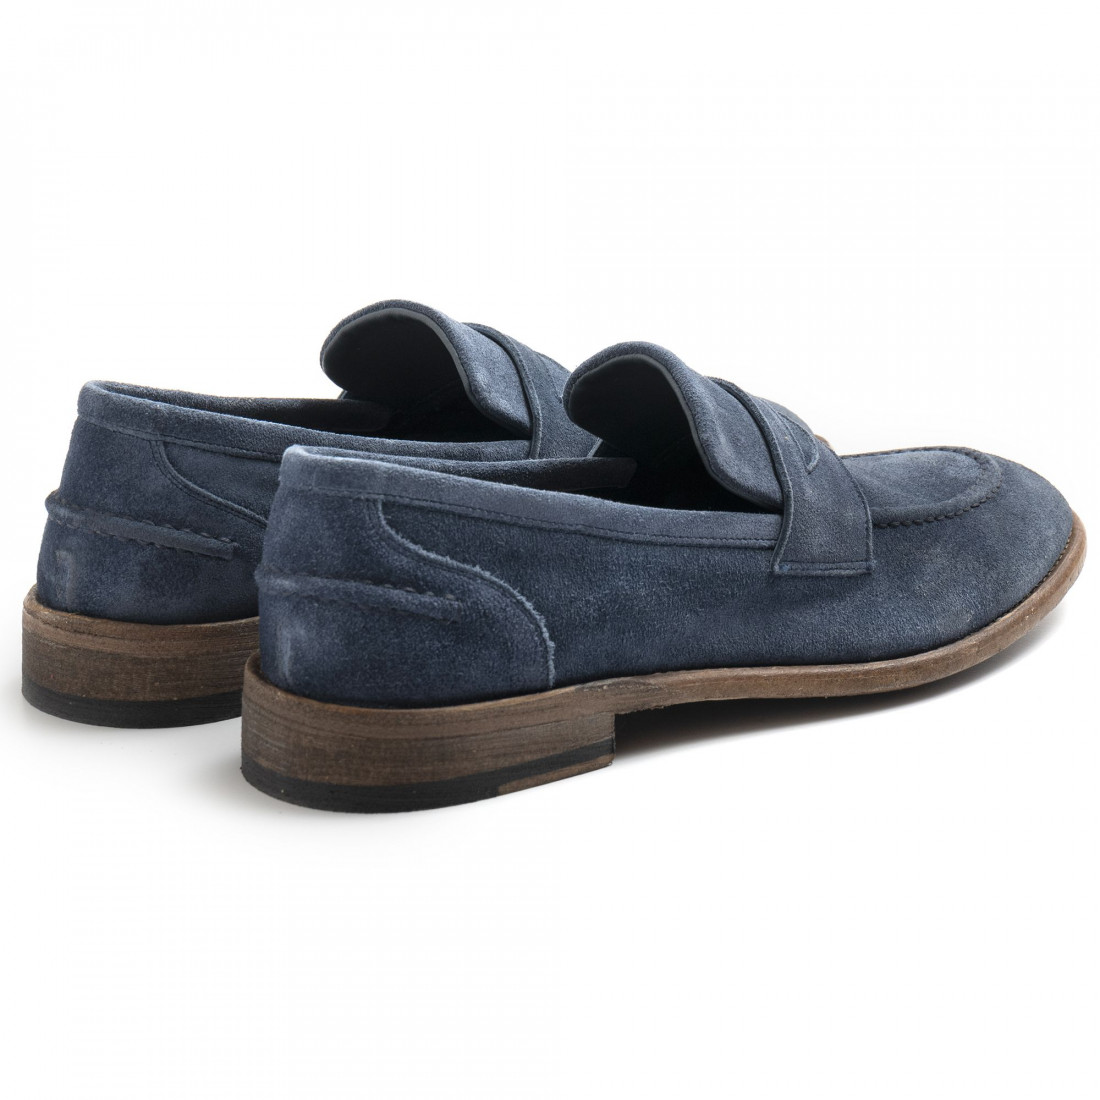 loafers man calpierre k003cawash ottanio 8489